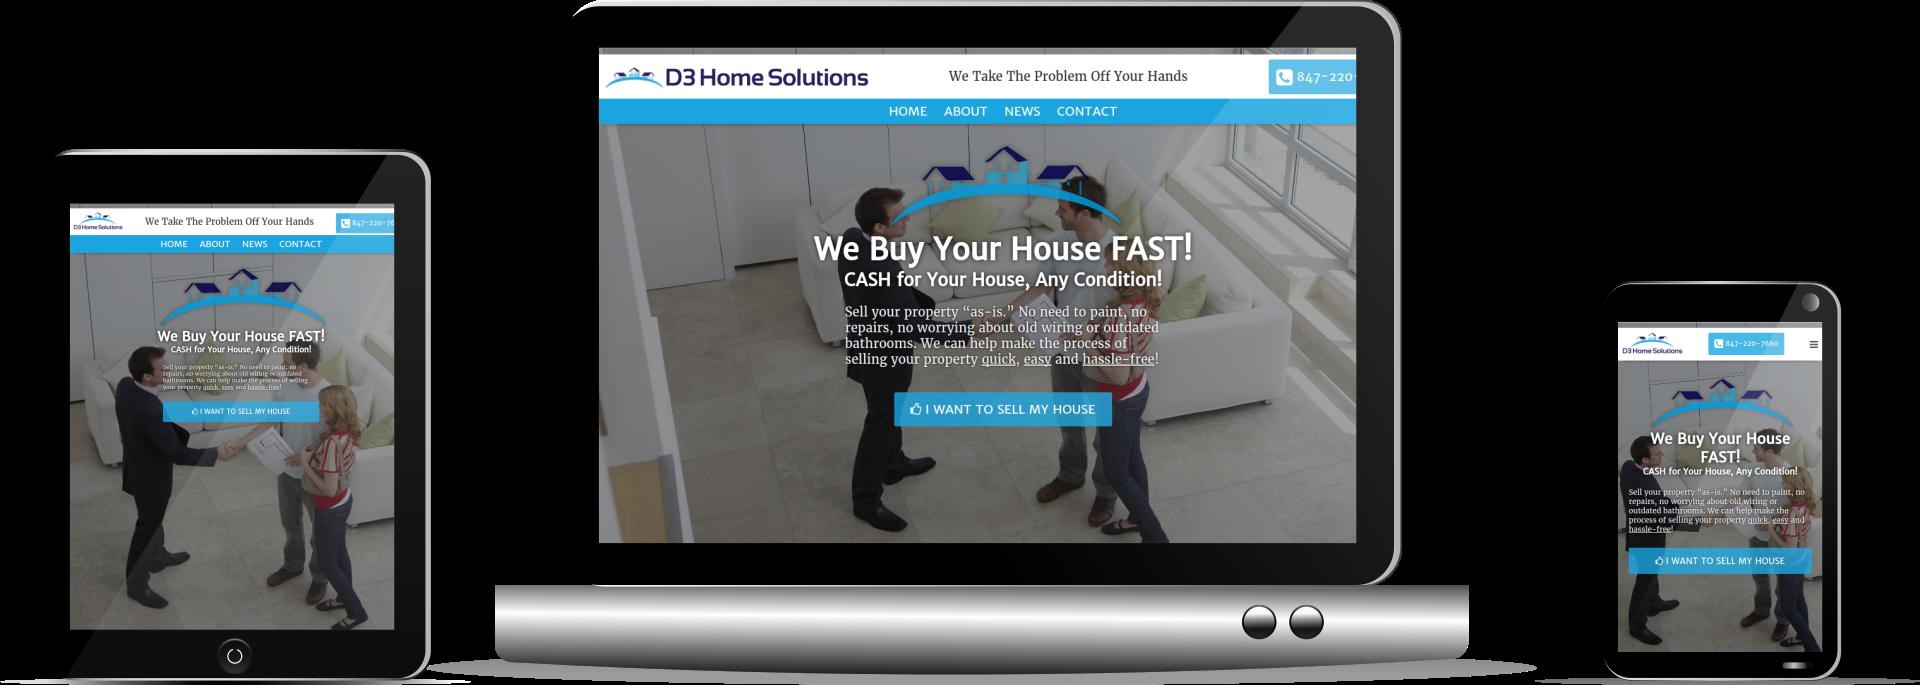 Davidson Paulo responsive set D3 Home Solutions